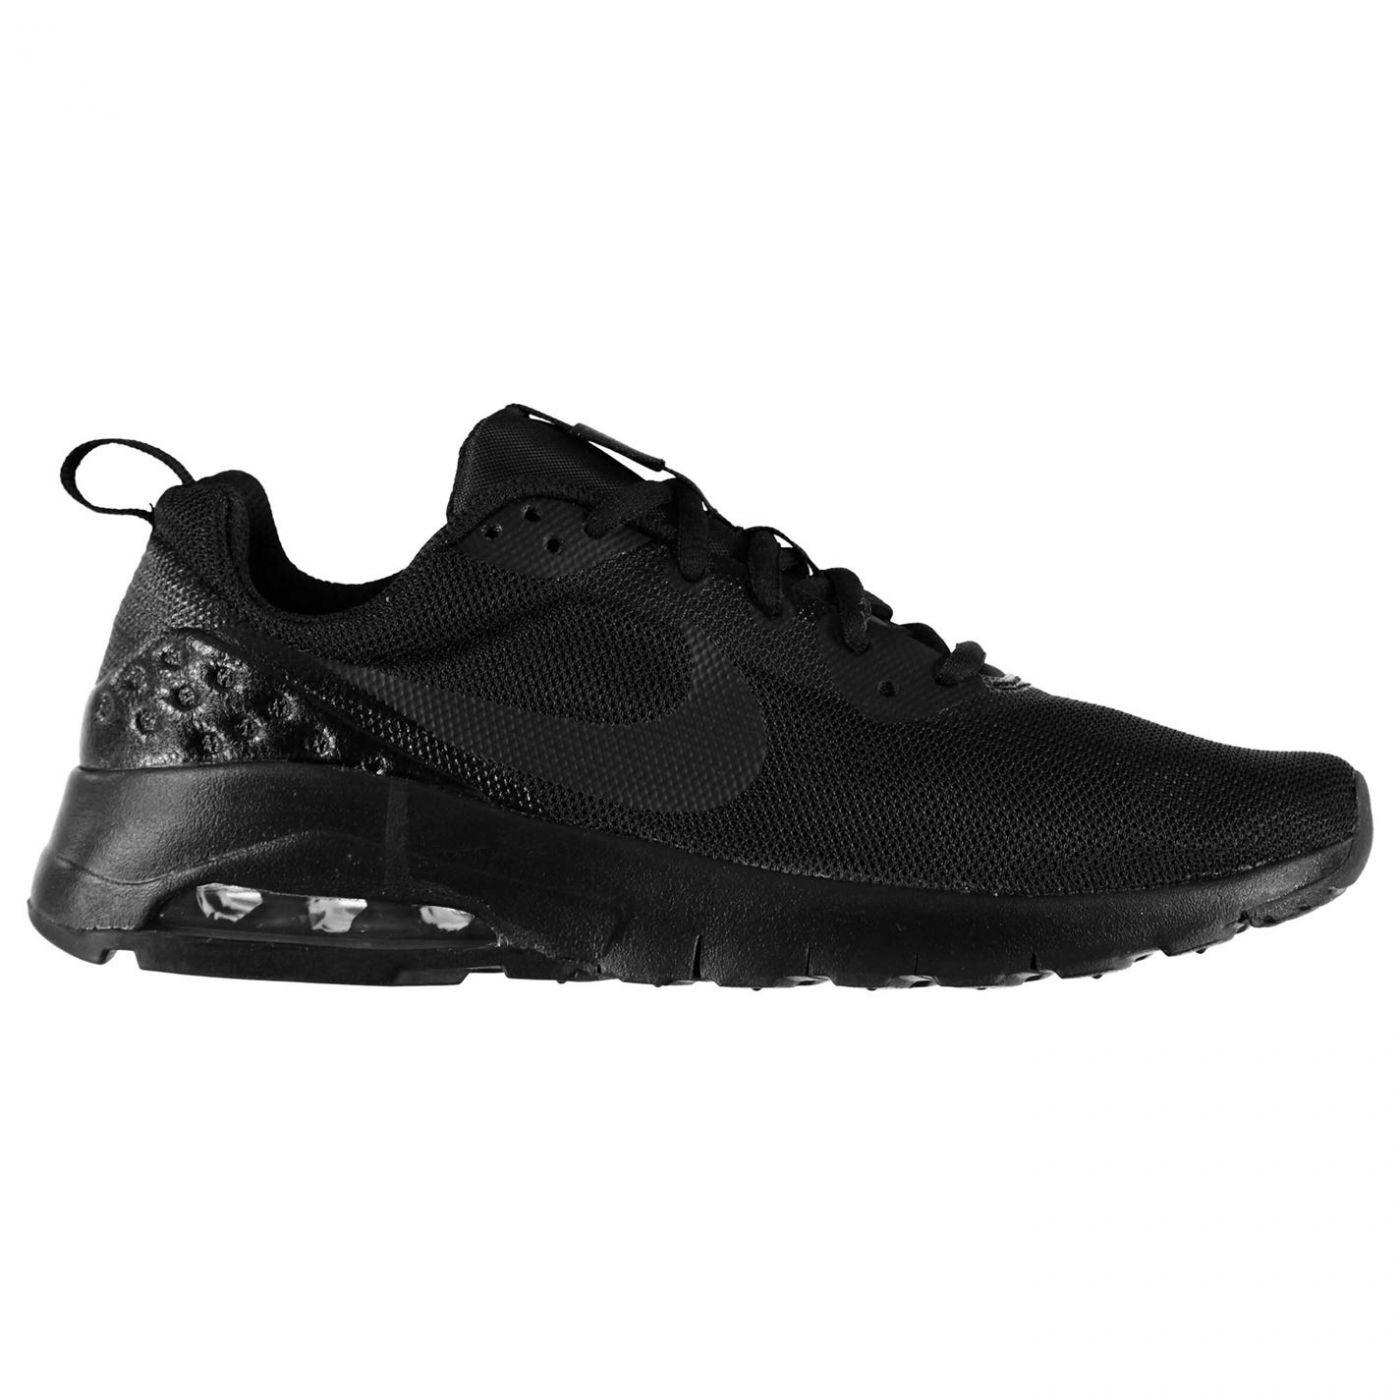 Nike Air Max Motion LW Trainers Junior Boys